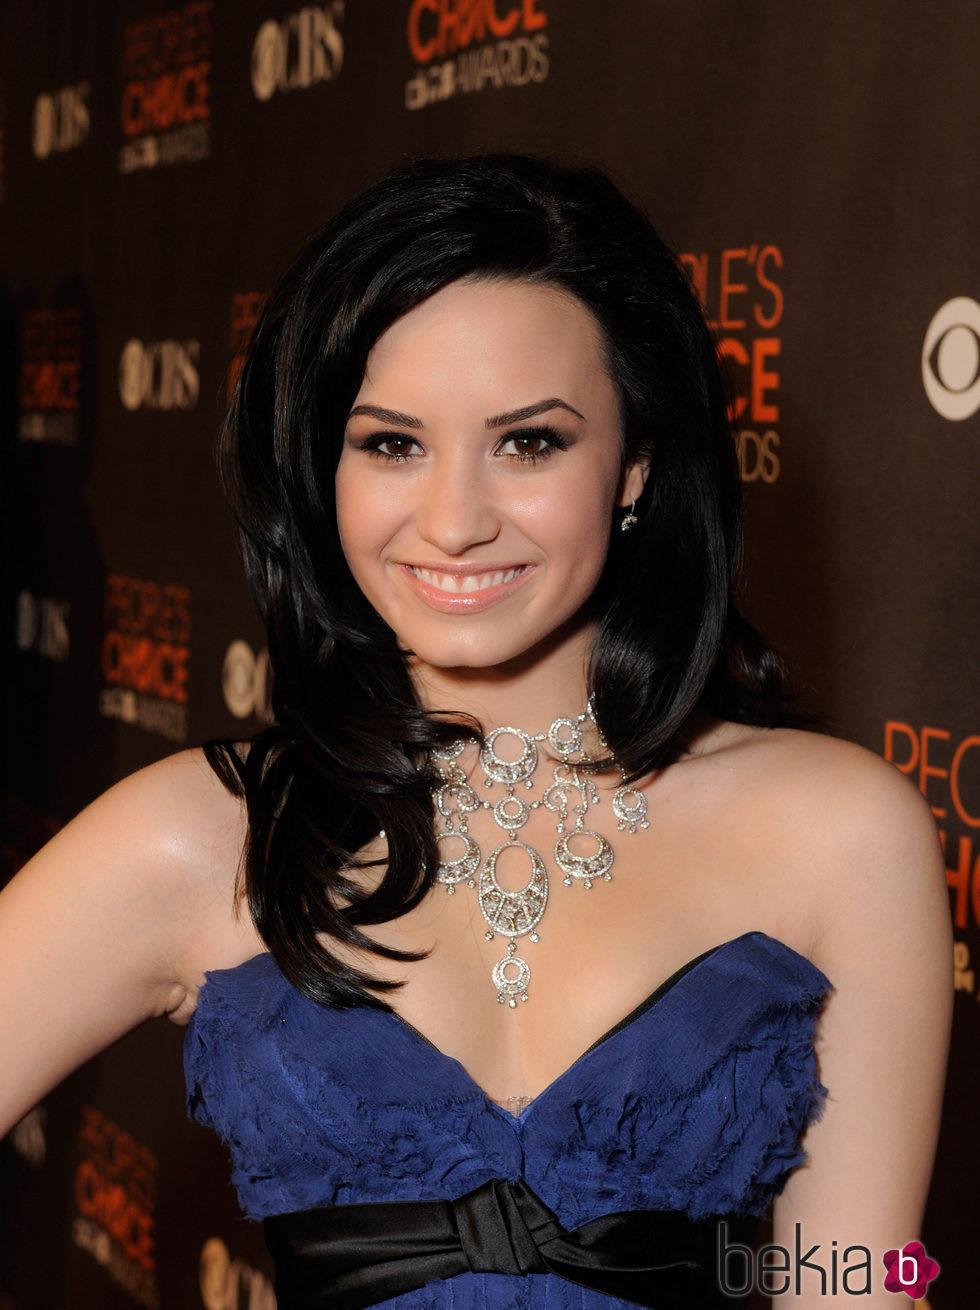 Demi Lovato con media melena en negro